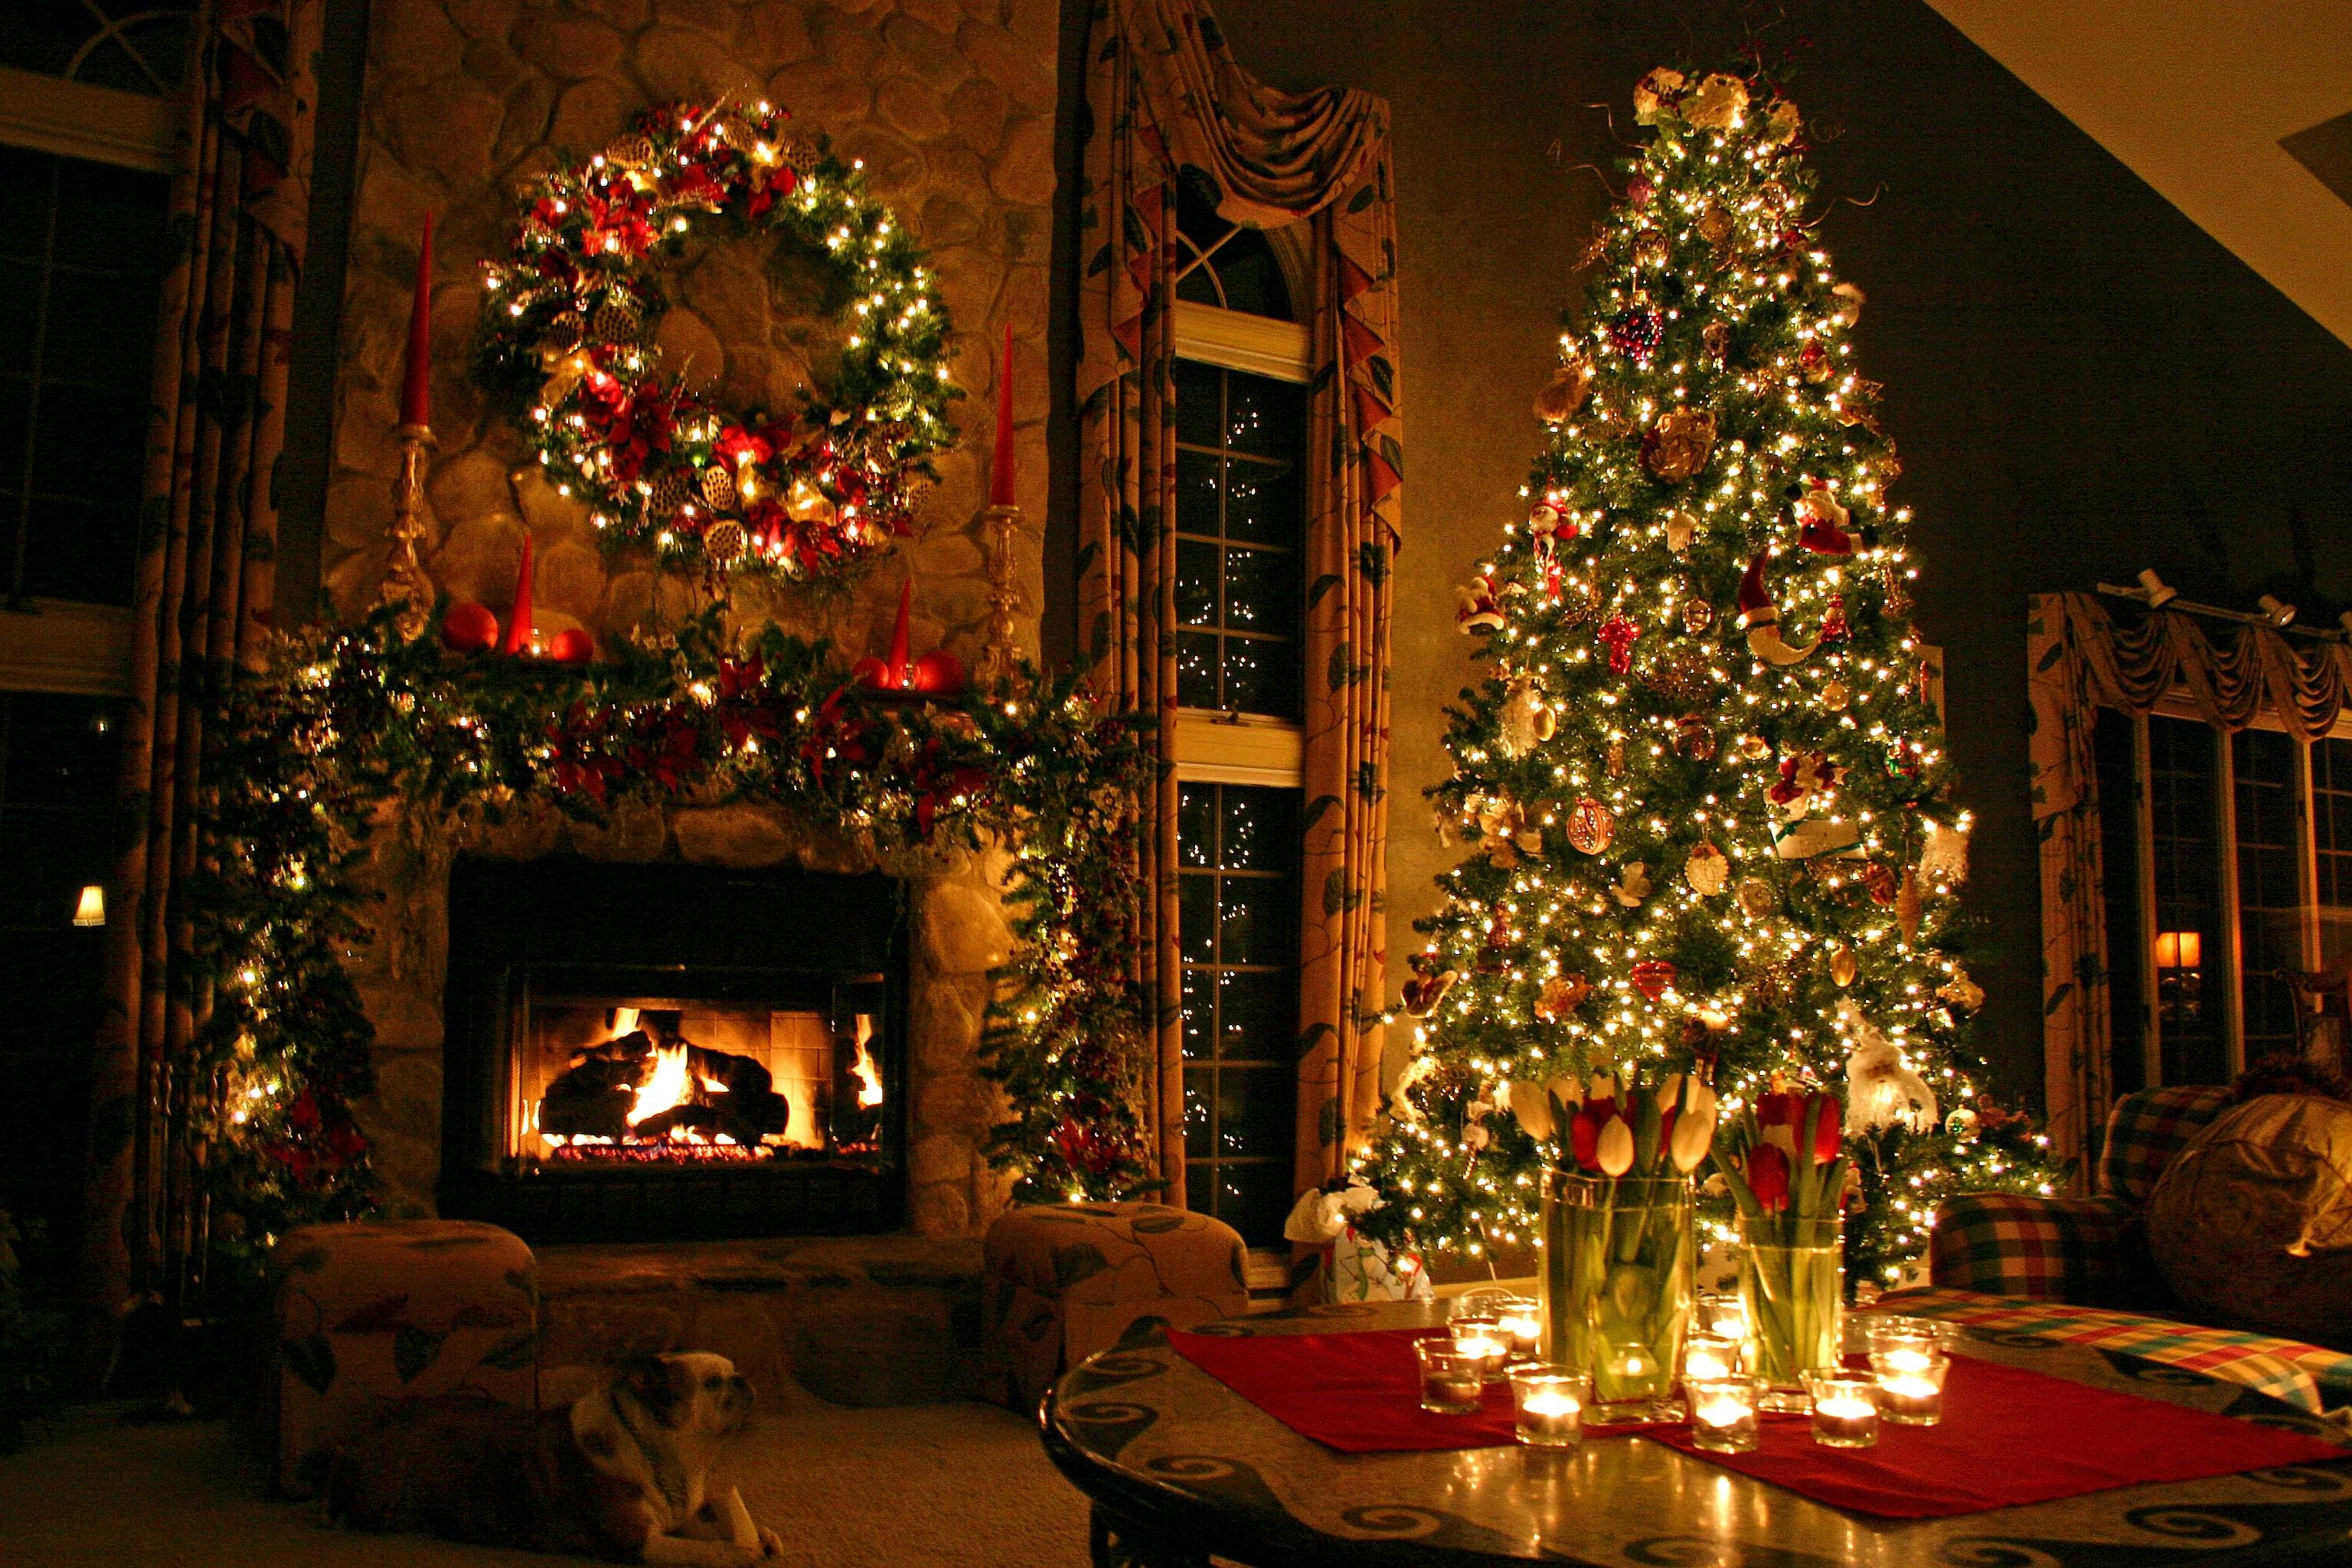 Christmas Lights Desktop Wallpaper 60 Pictures